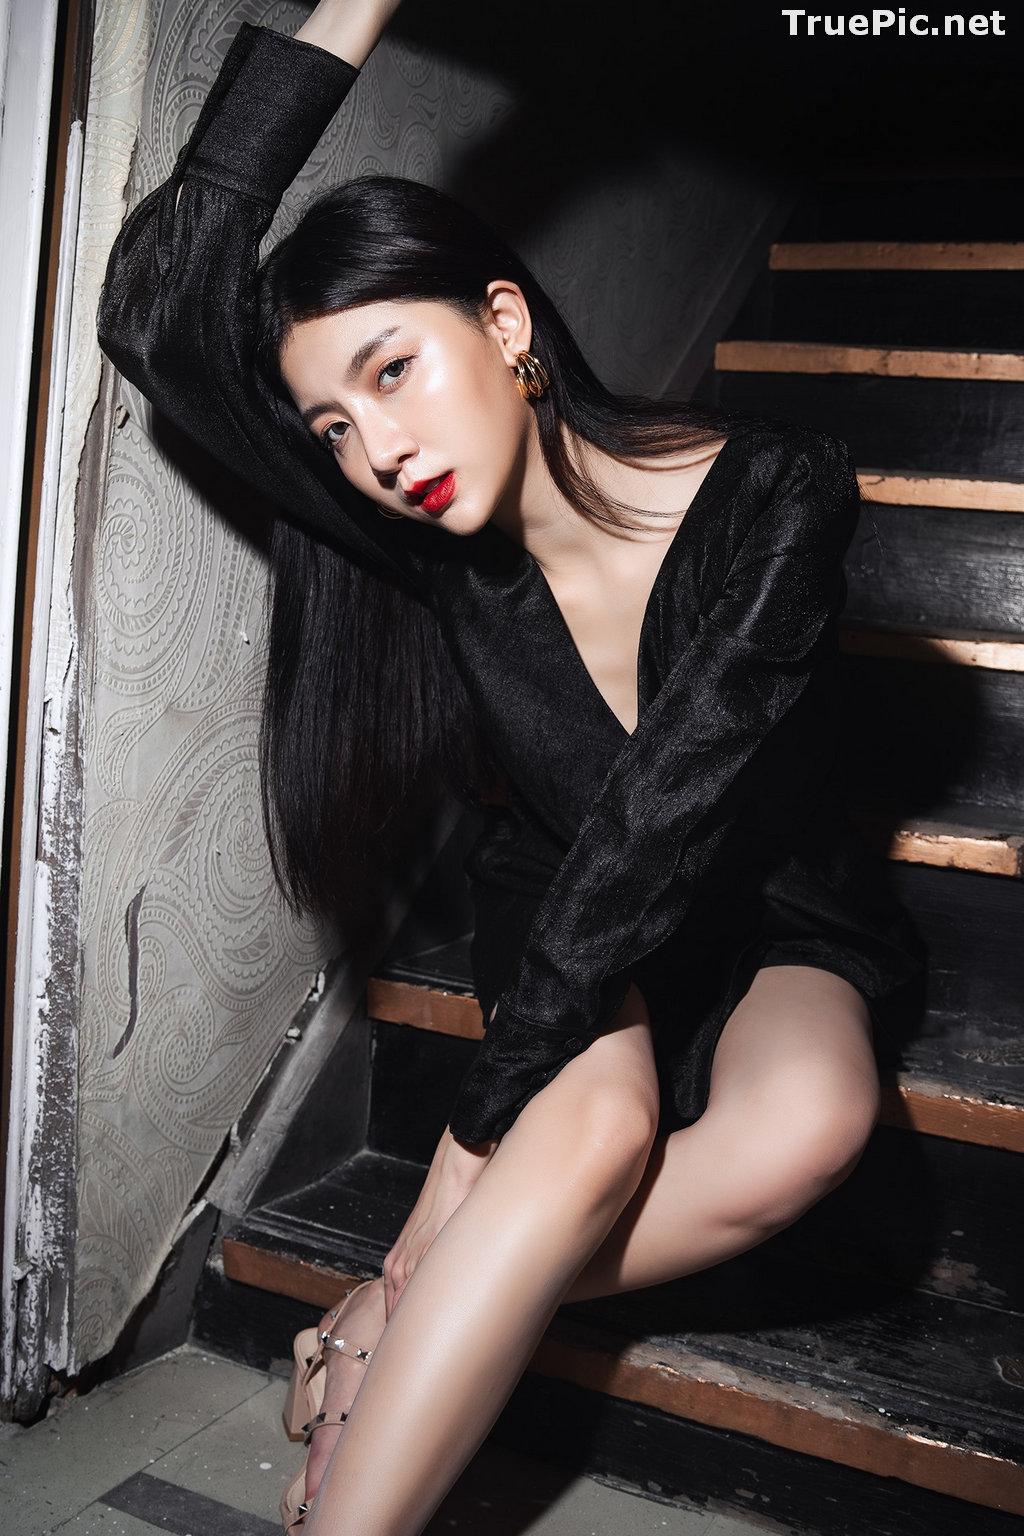 Image Thailand Model - Sasi Ngiunwan - Black For SiamNight - TruePic.net - Picture-18